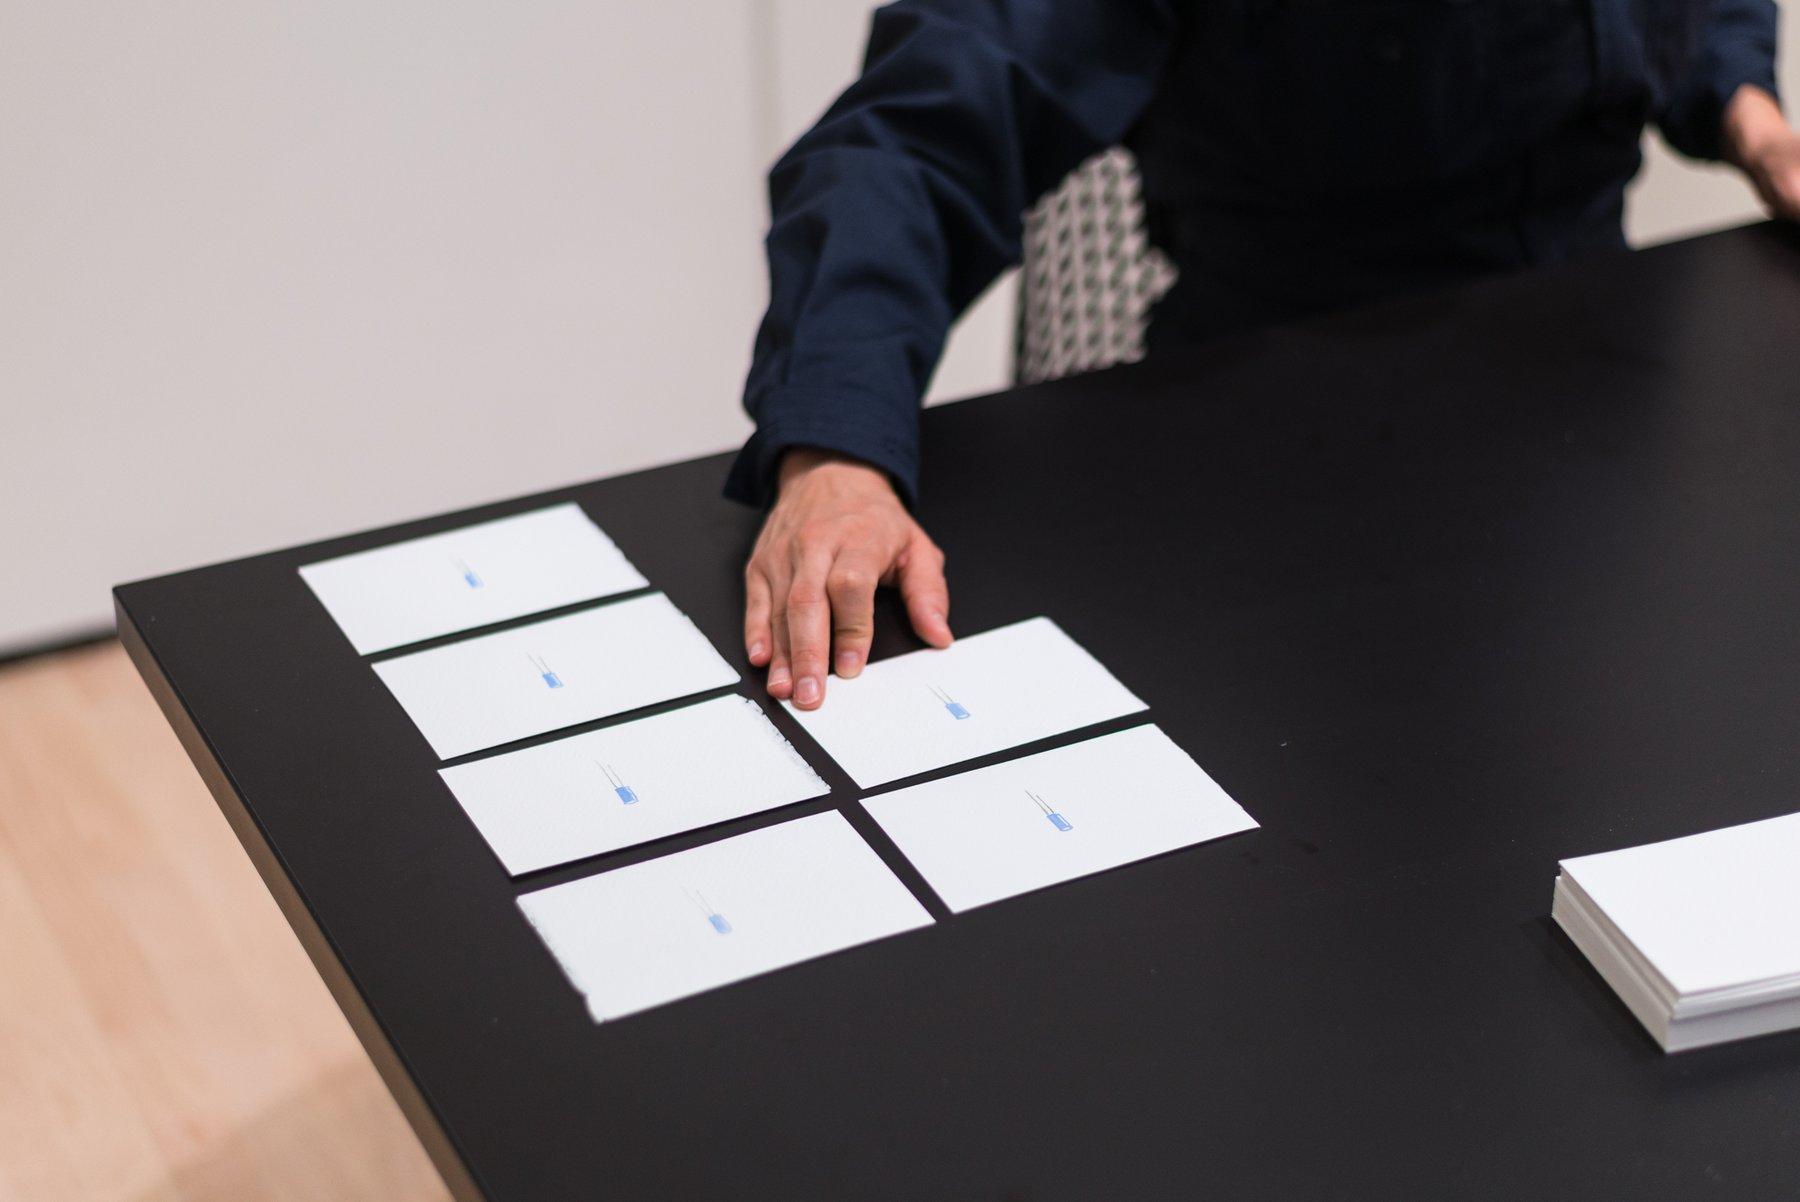 A hand arranges rectangular white cards on a black table, Munoz, Sountracks